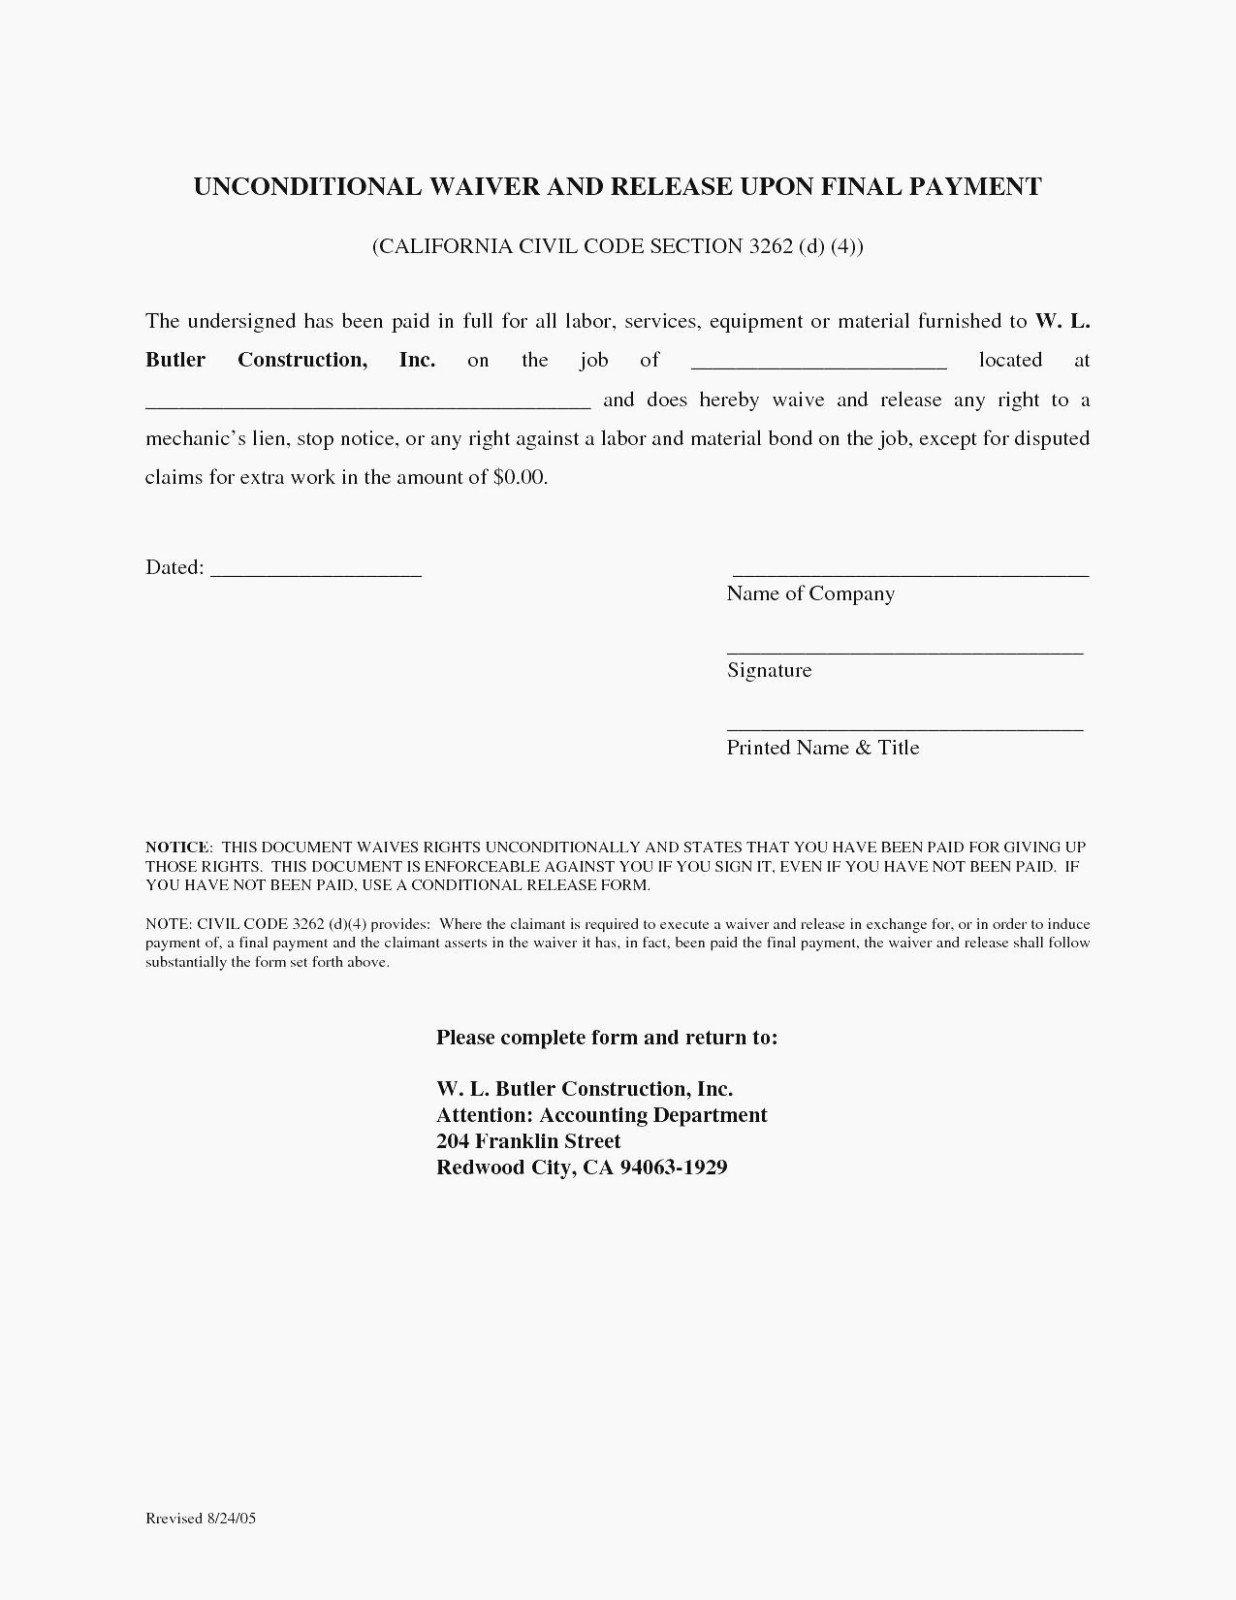 Lien Release Letter Template Inspirational the Death Construction